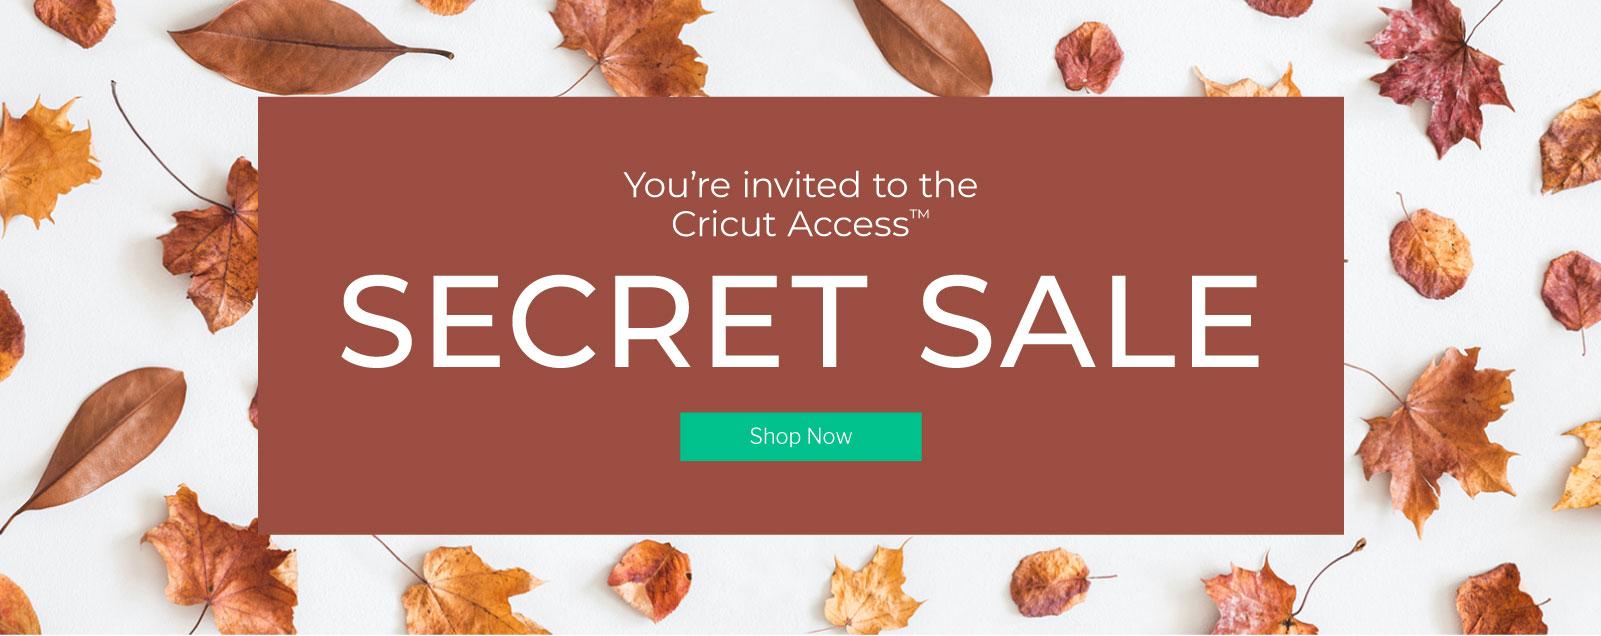 You're invited to the Cricut Access Secret Sale